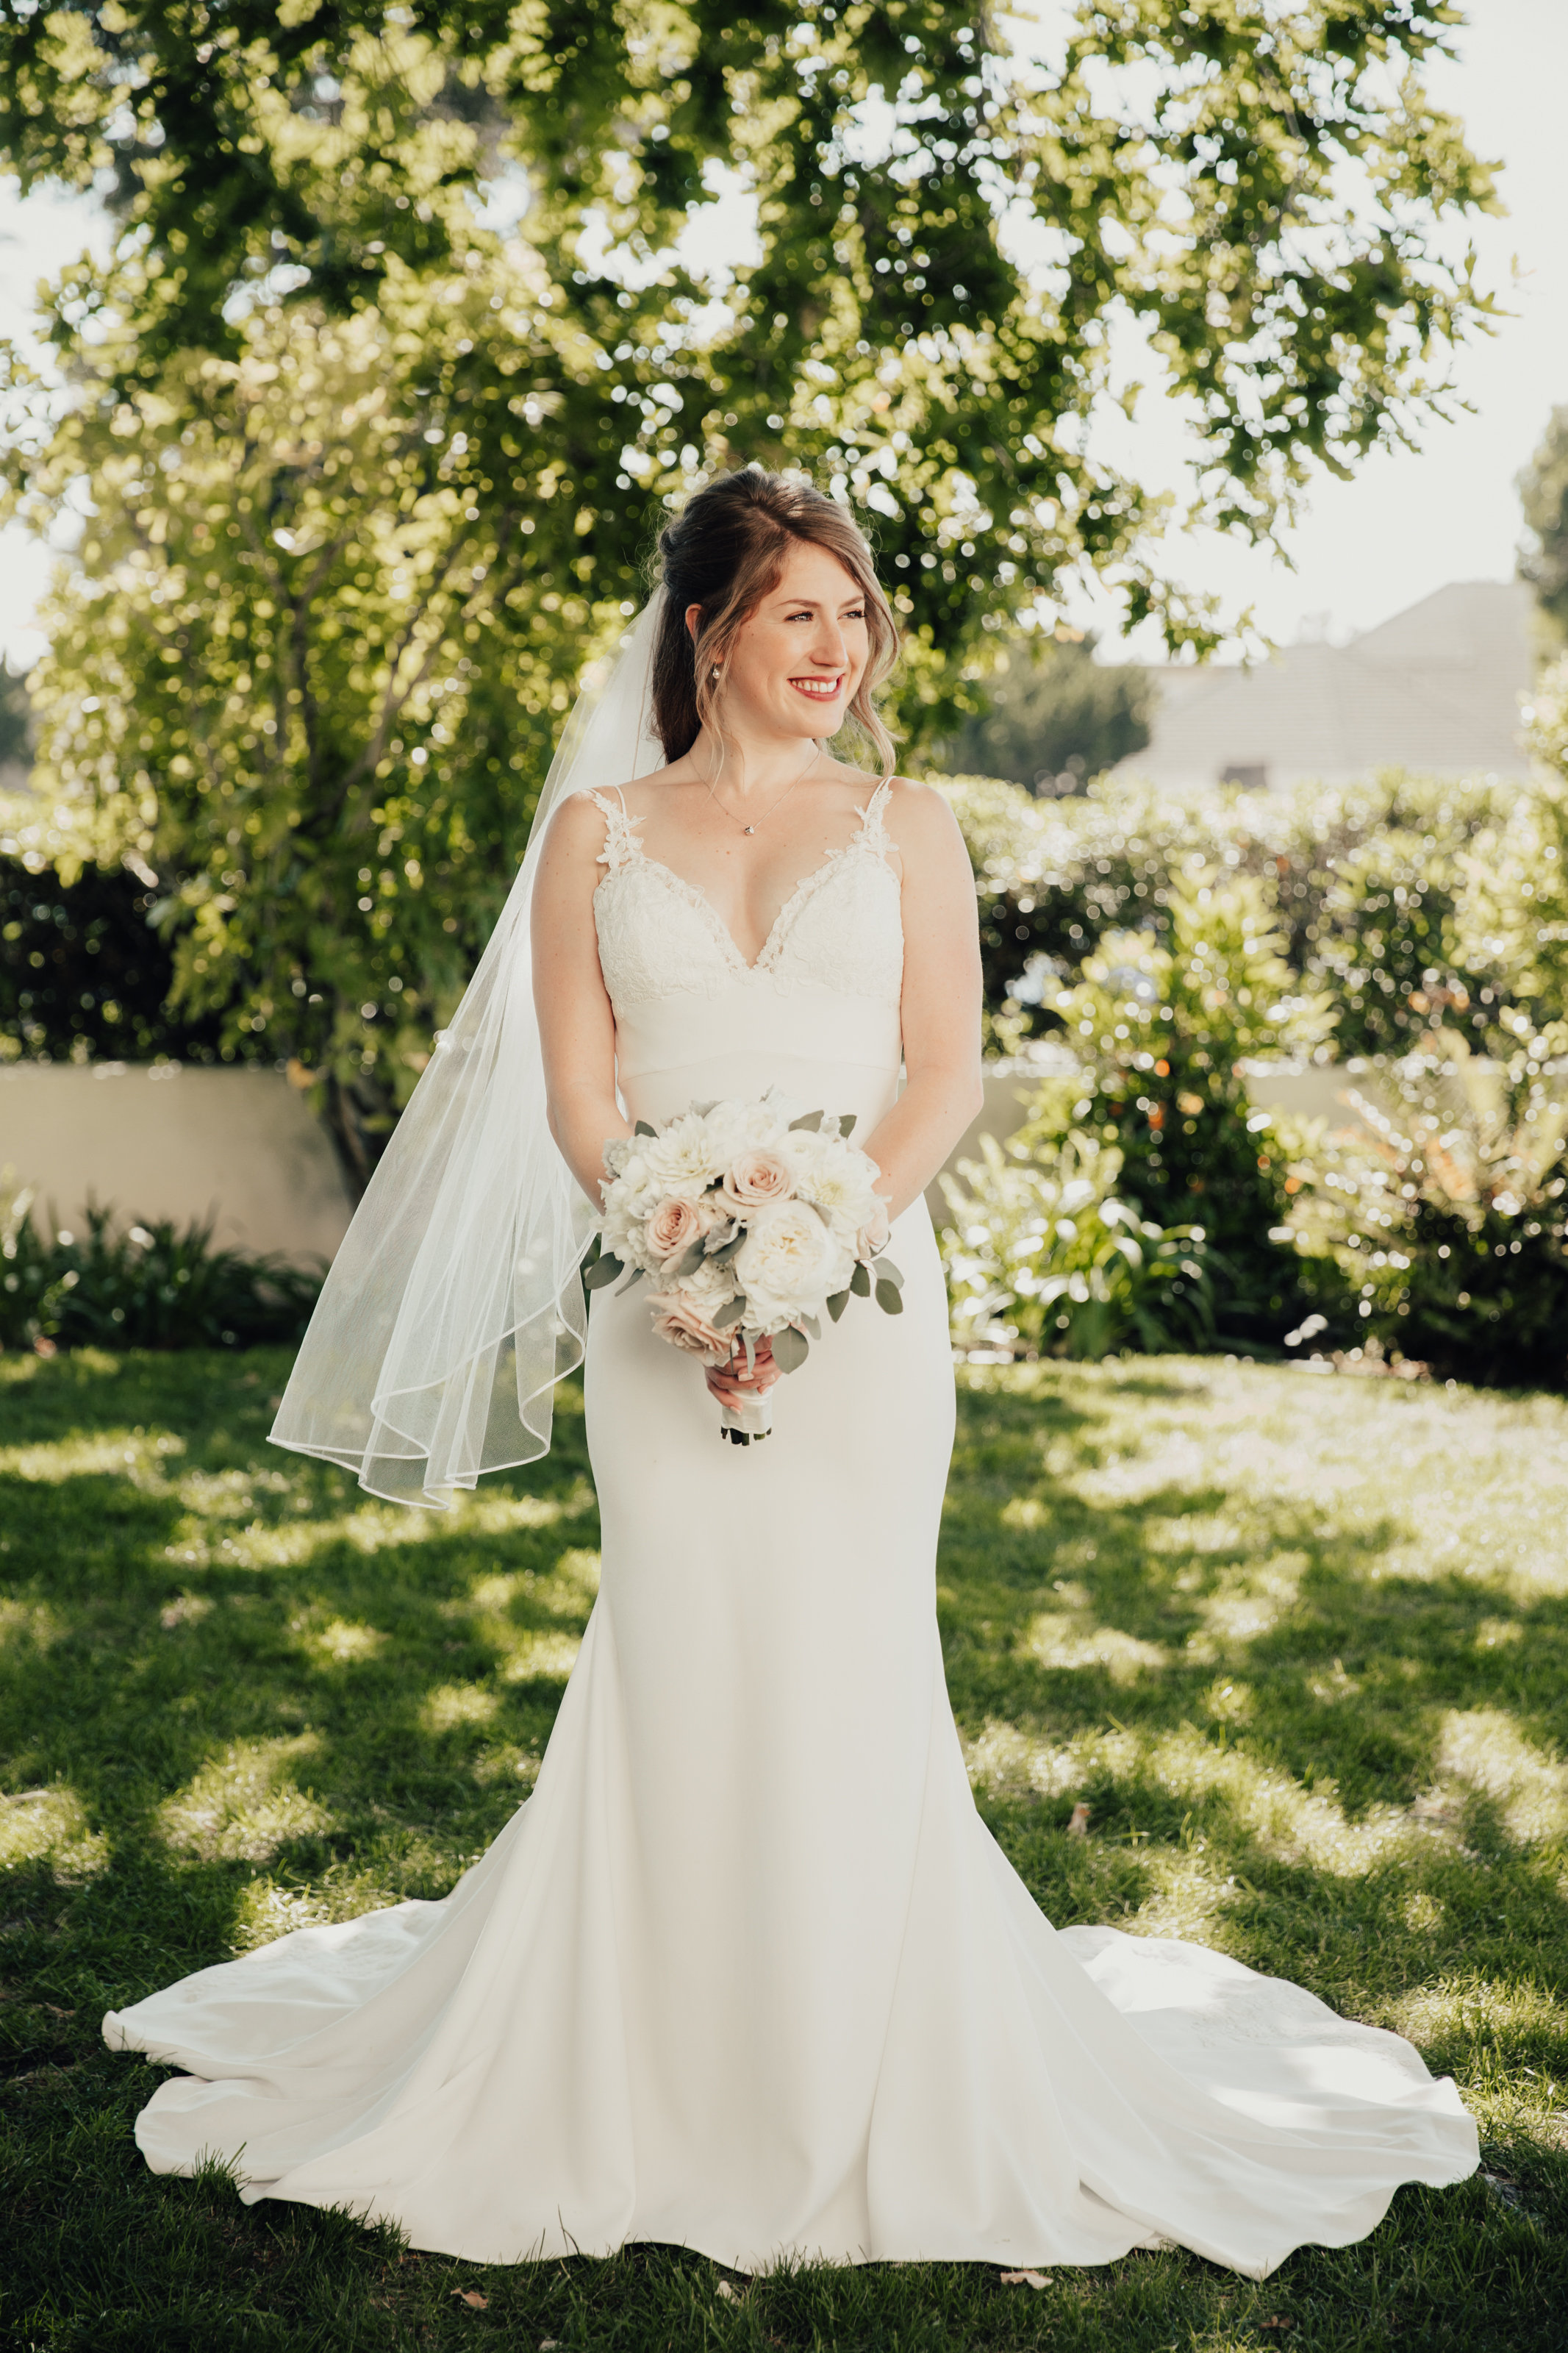 Saramaya Zach-Saramaya Zach wedding-0501* copy.jpg